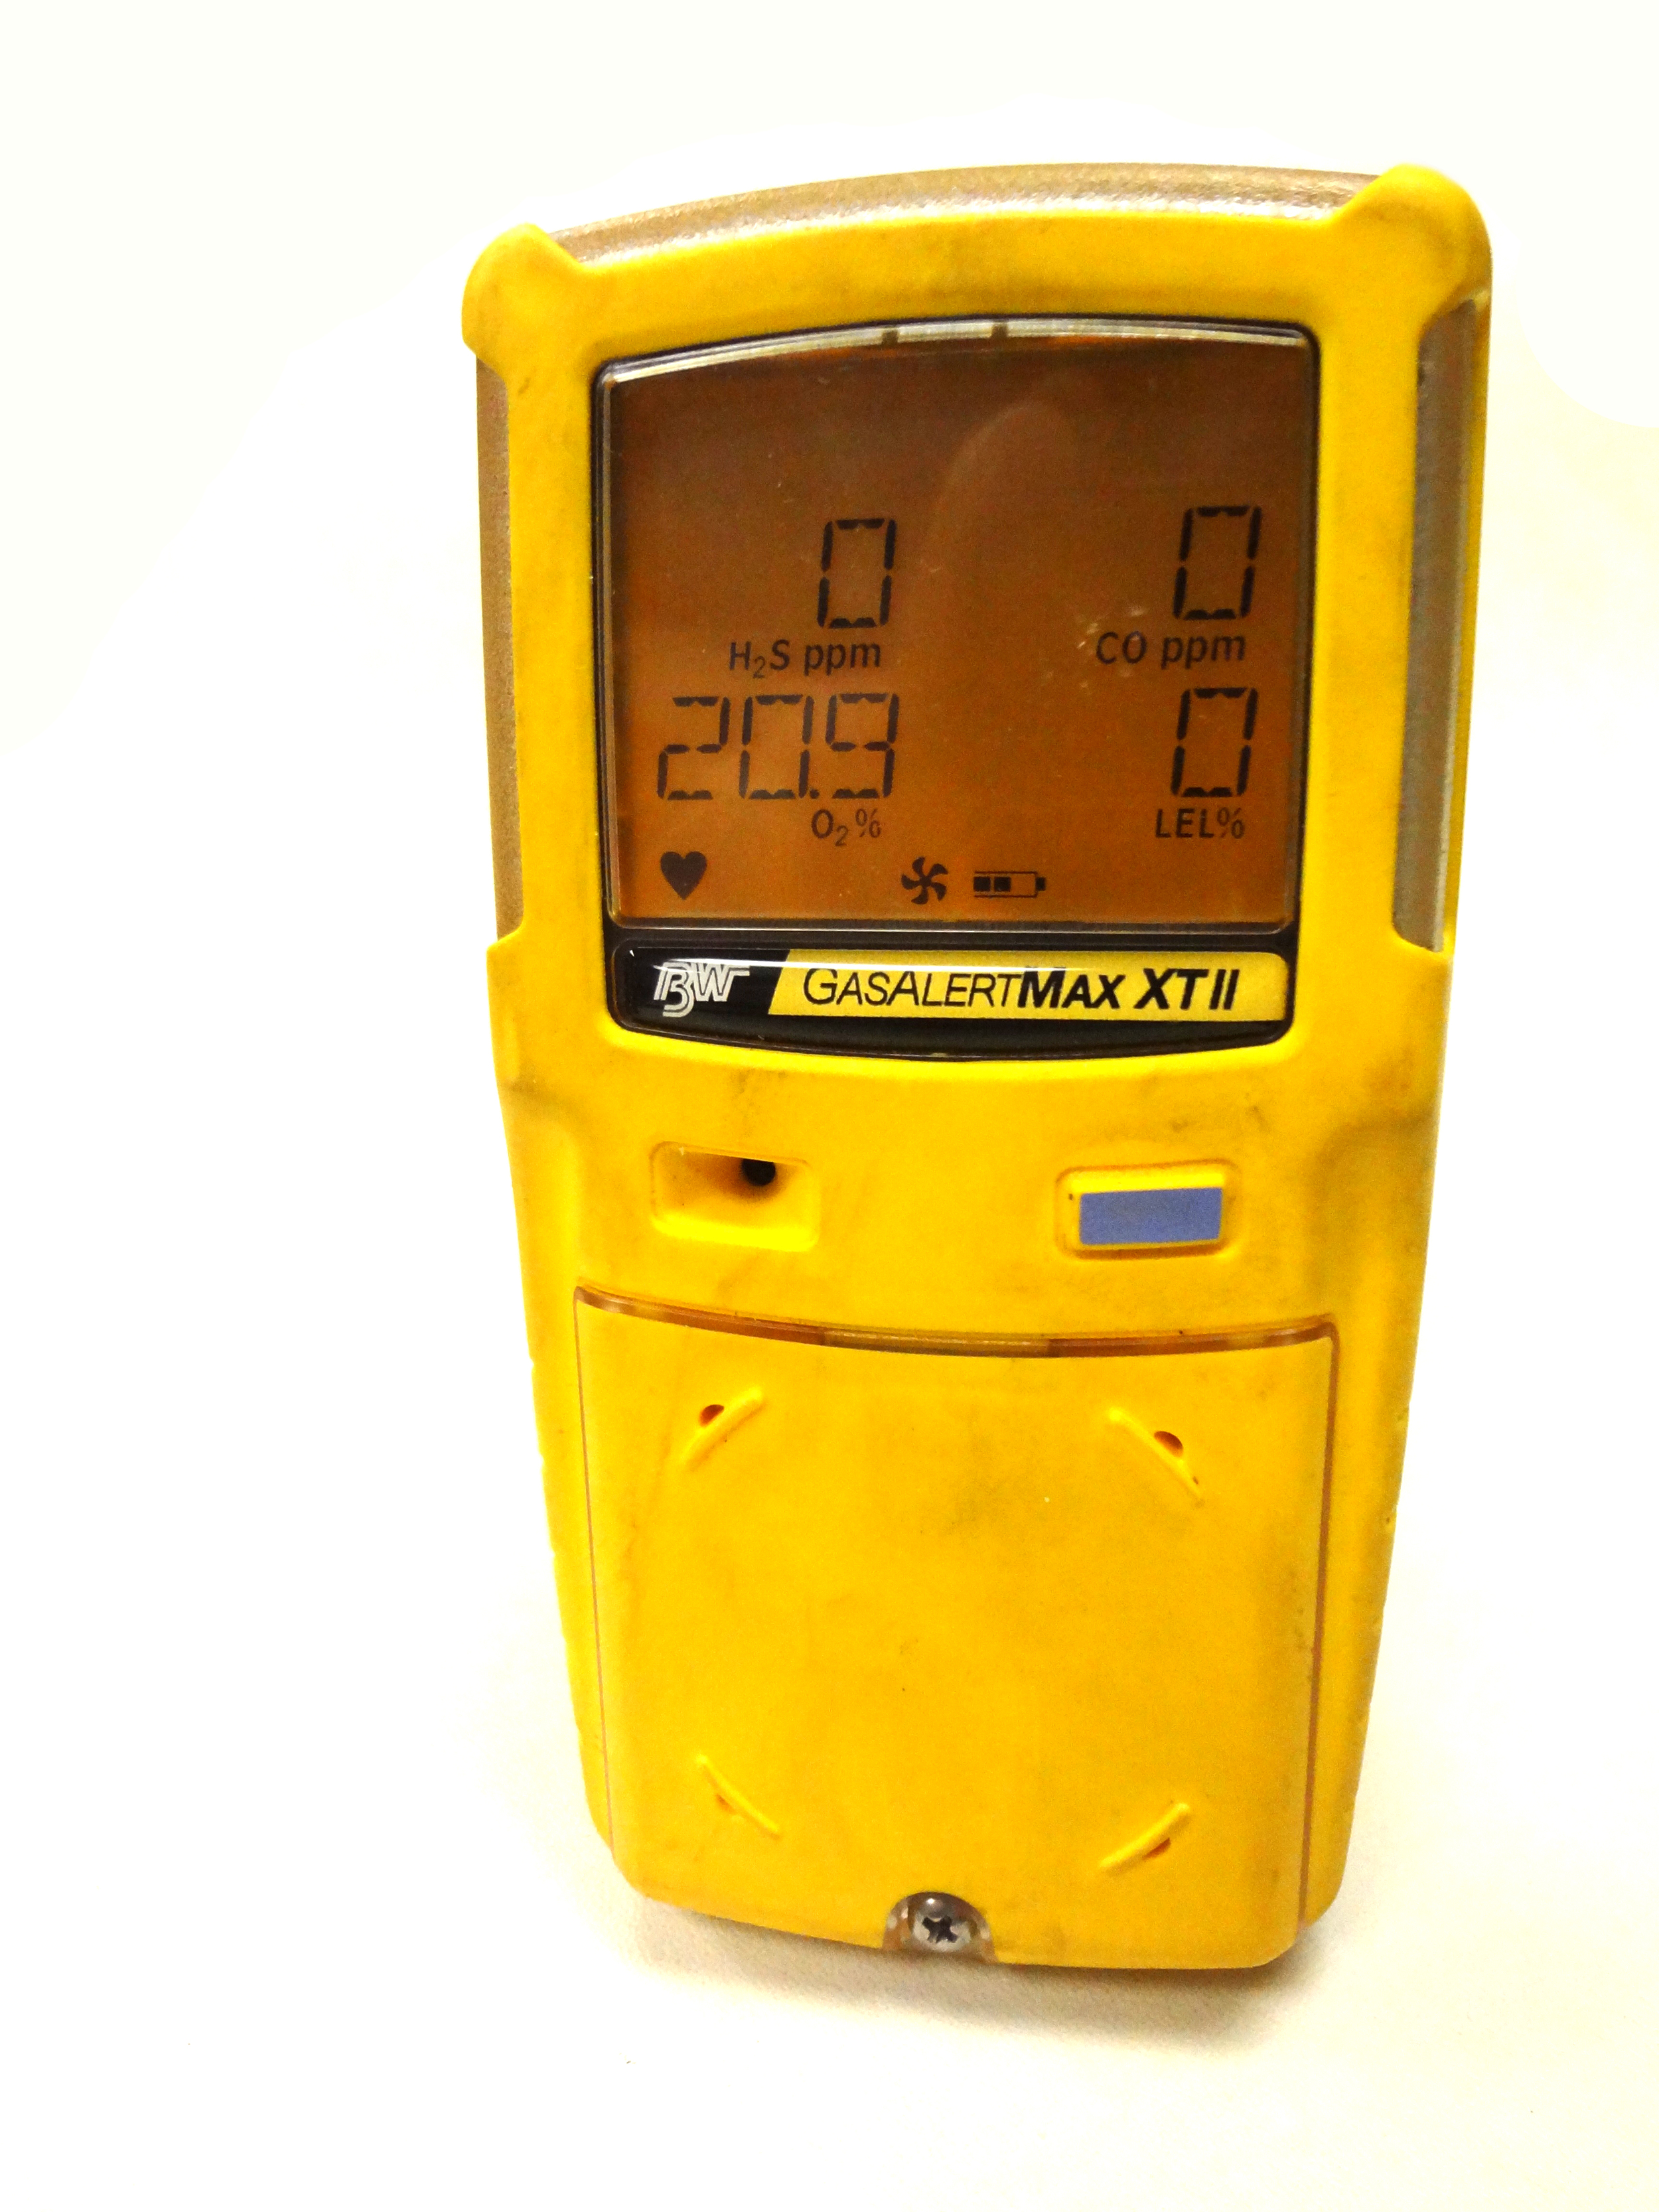 BW-Technologies-Gas-Alert-Max-XT-II-O2-good.JPG